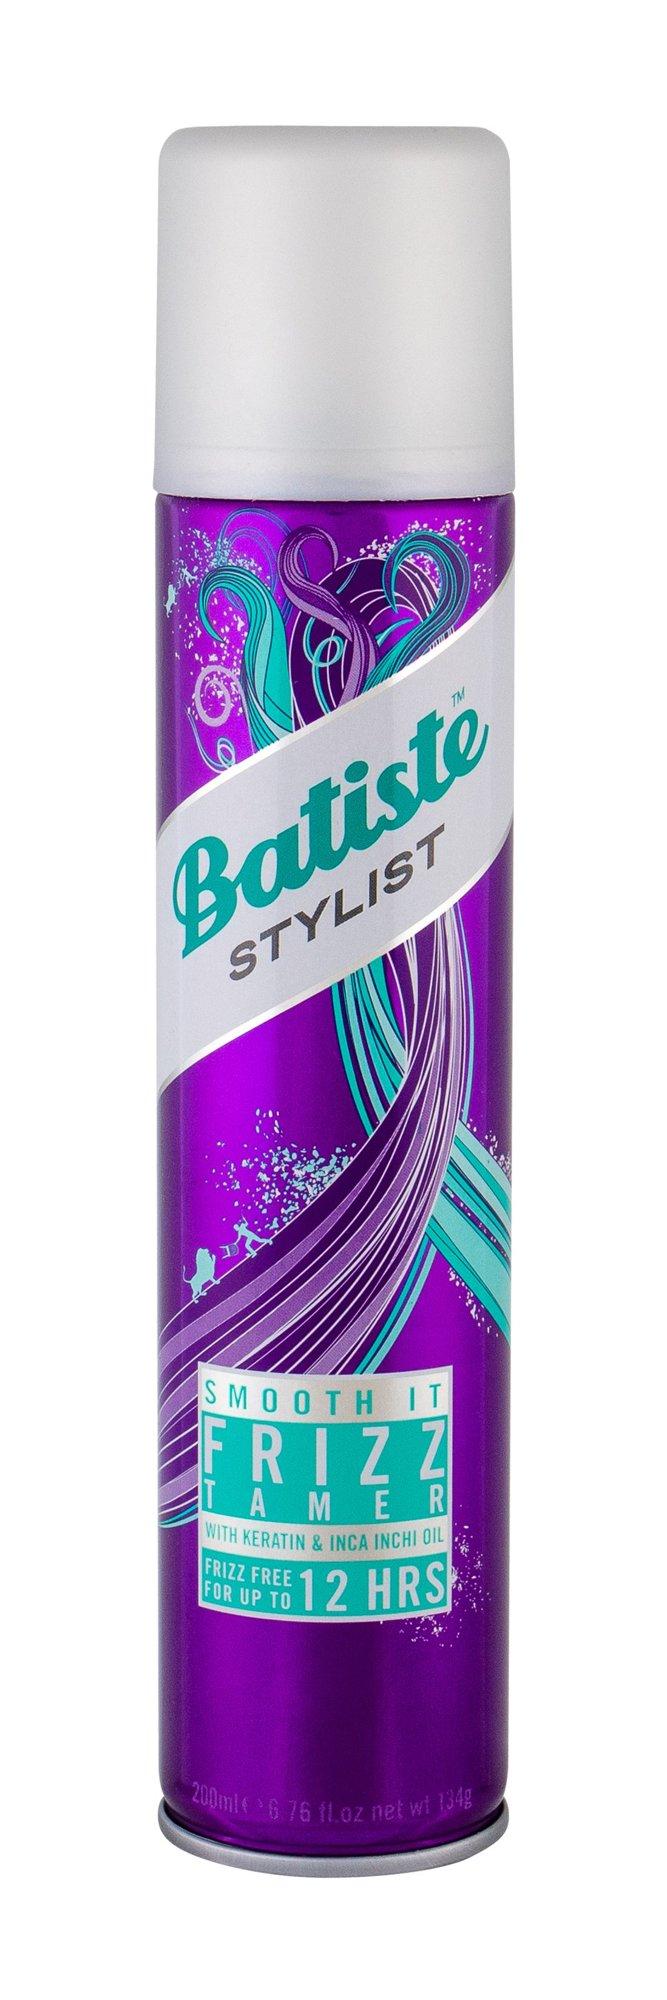 Batiste Stylist Hair Smoothing 200ml